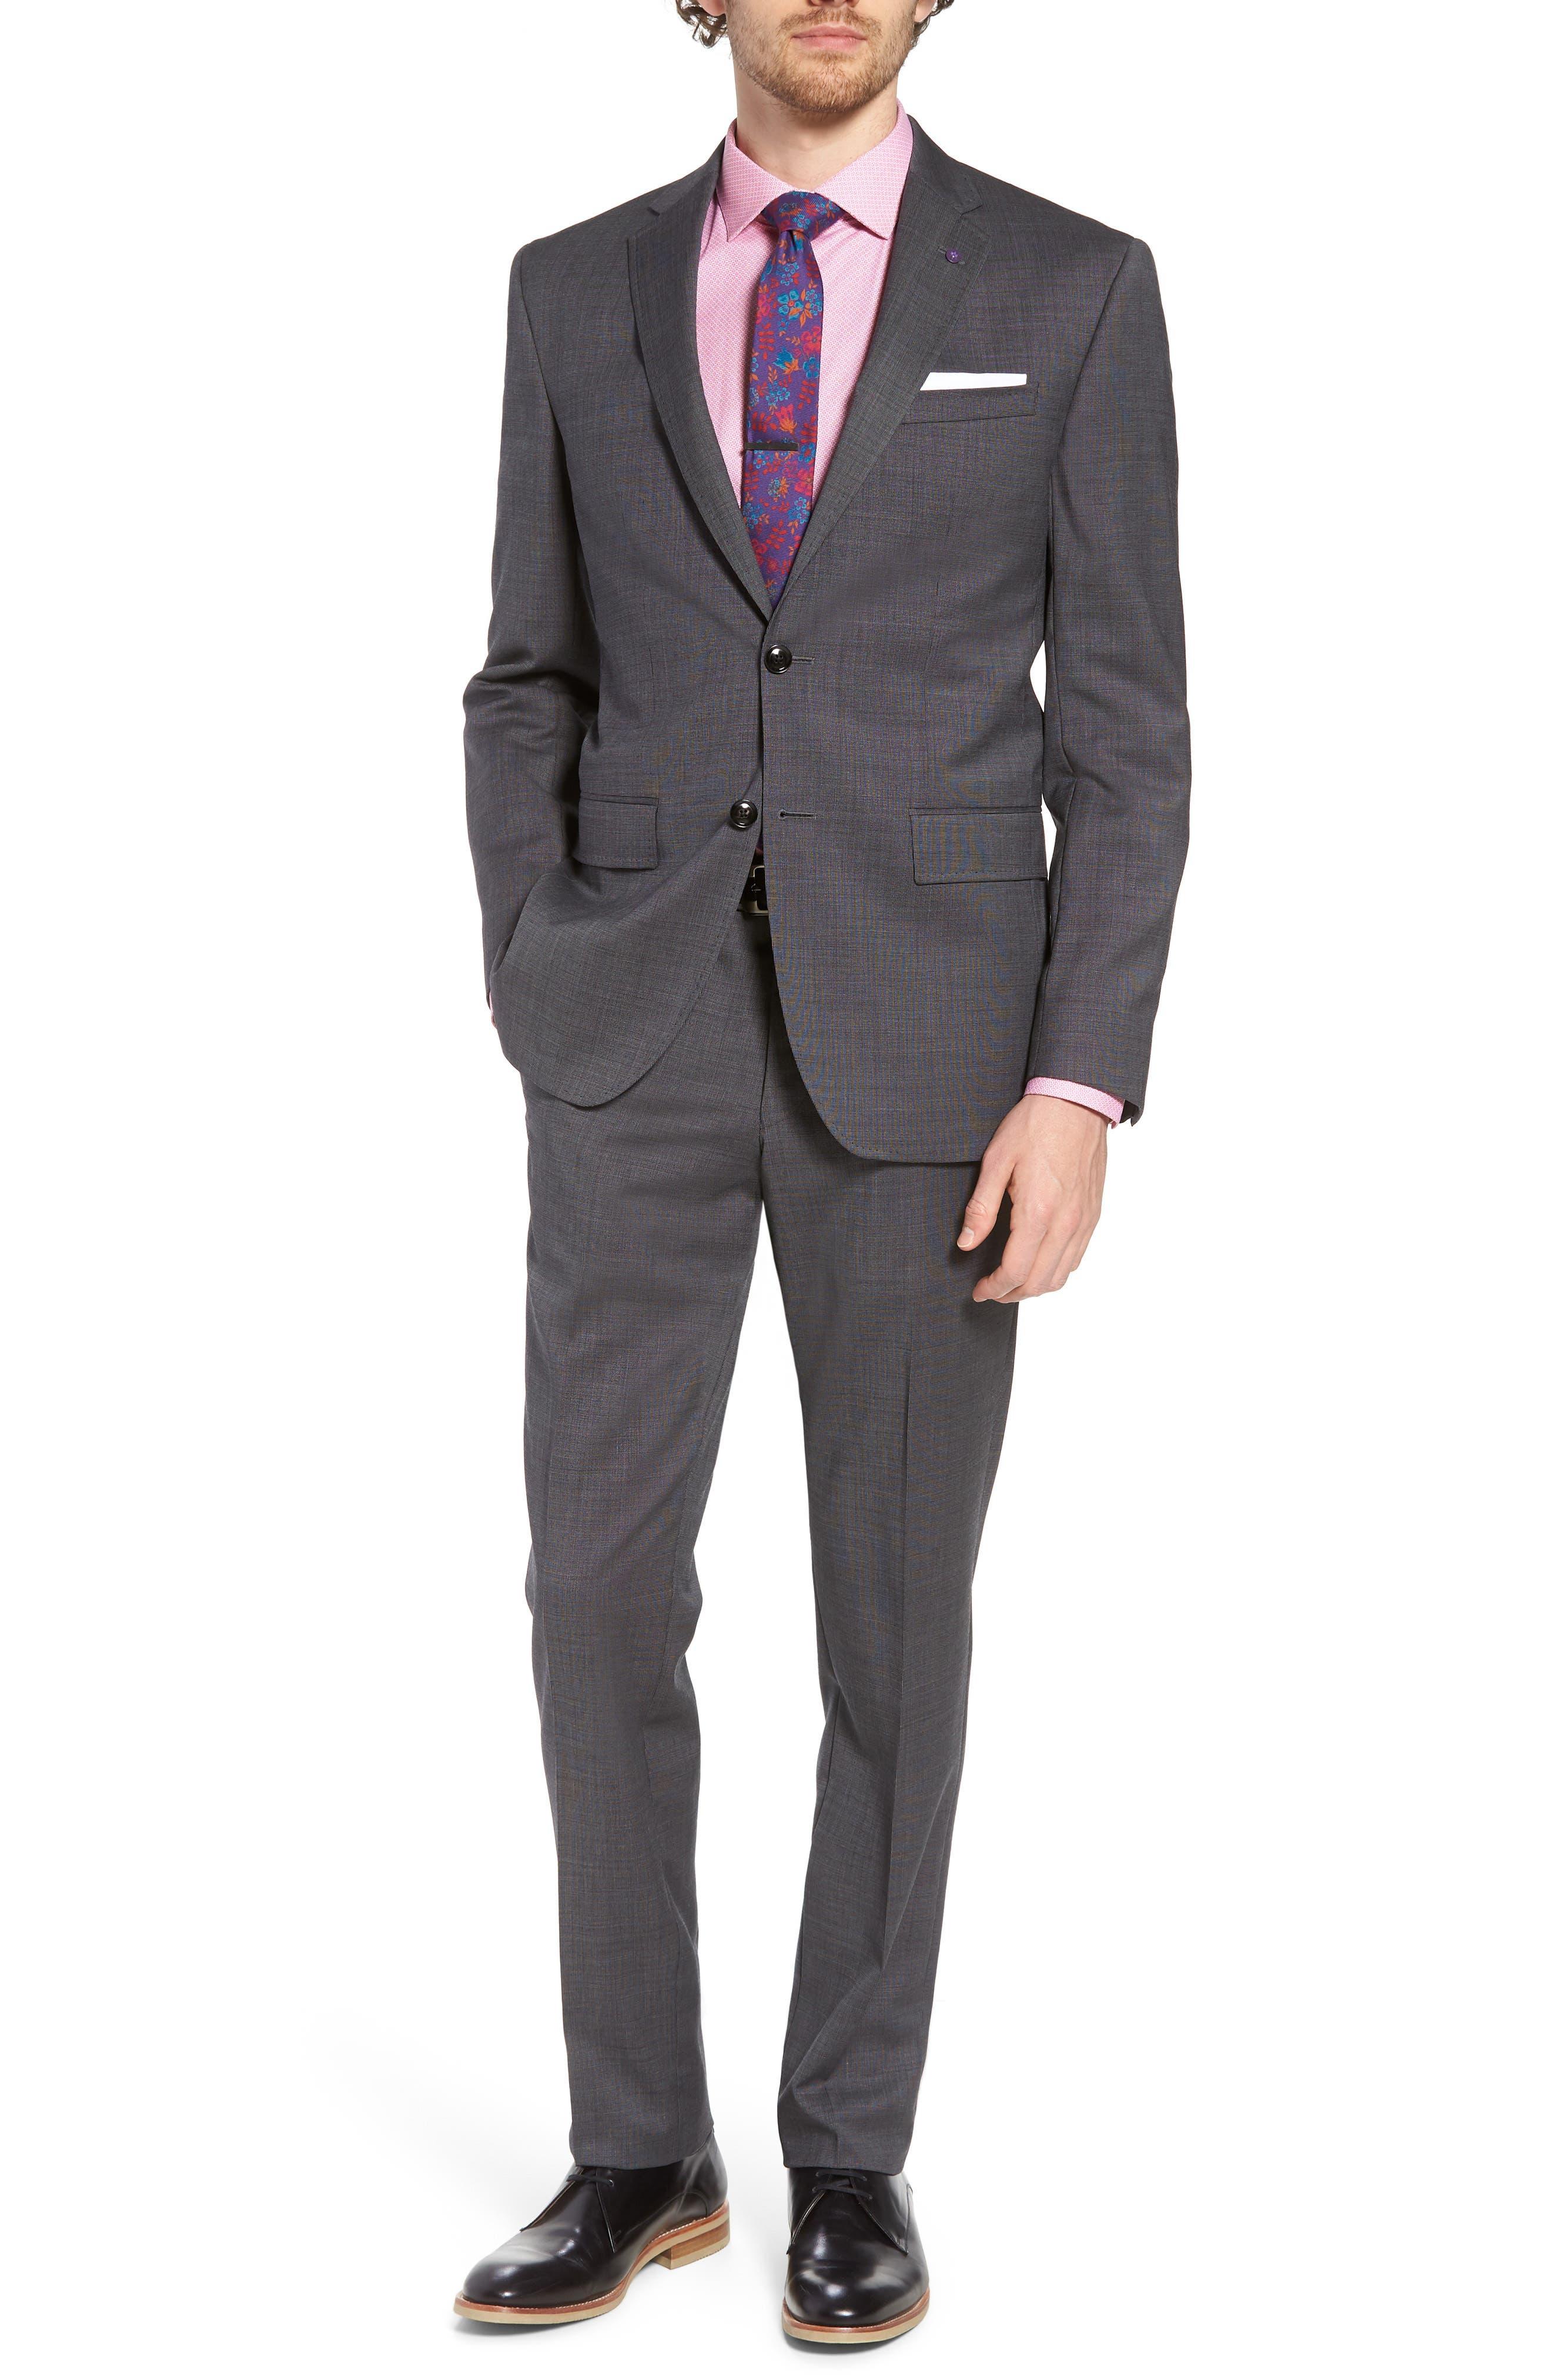 Jay Trim Fit Solid Wool Suit,                             Main thumbnail 1, color,                             020